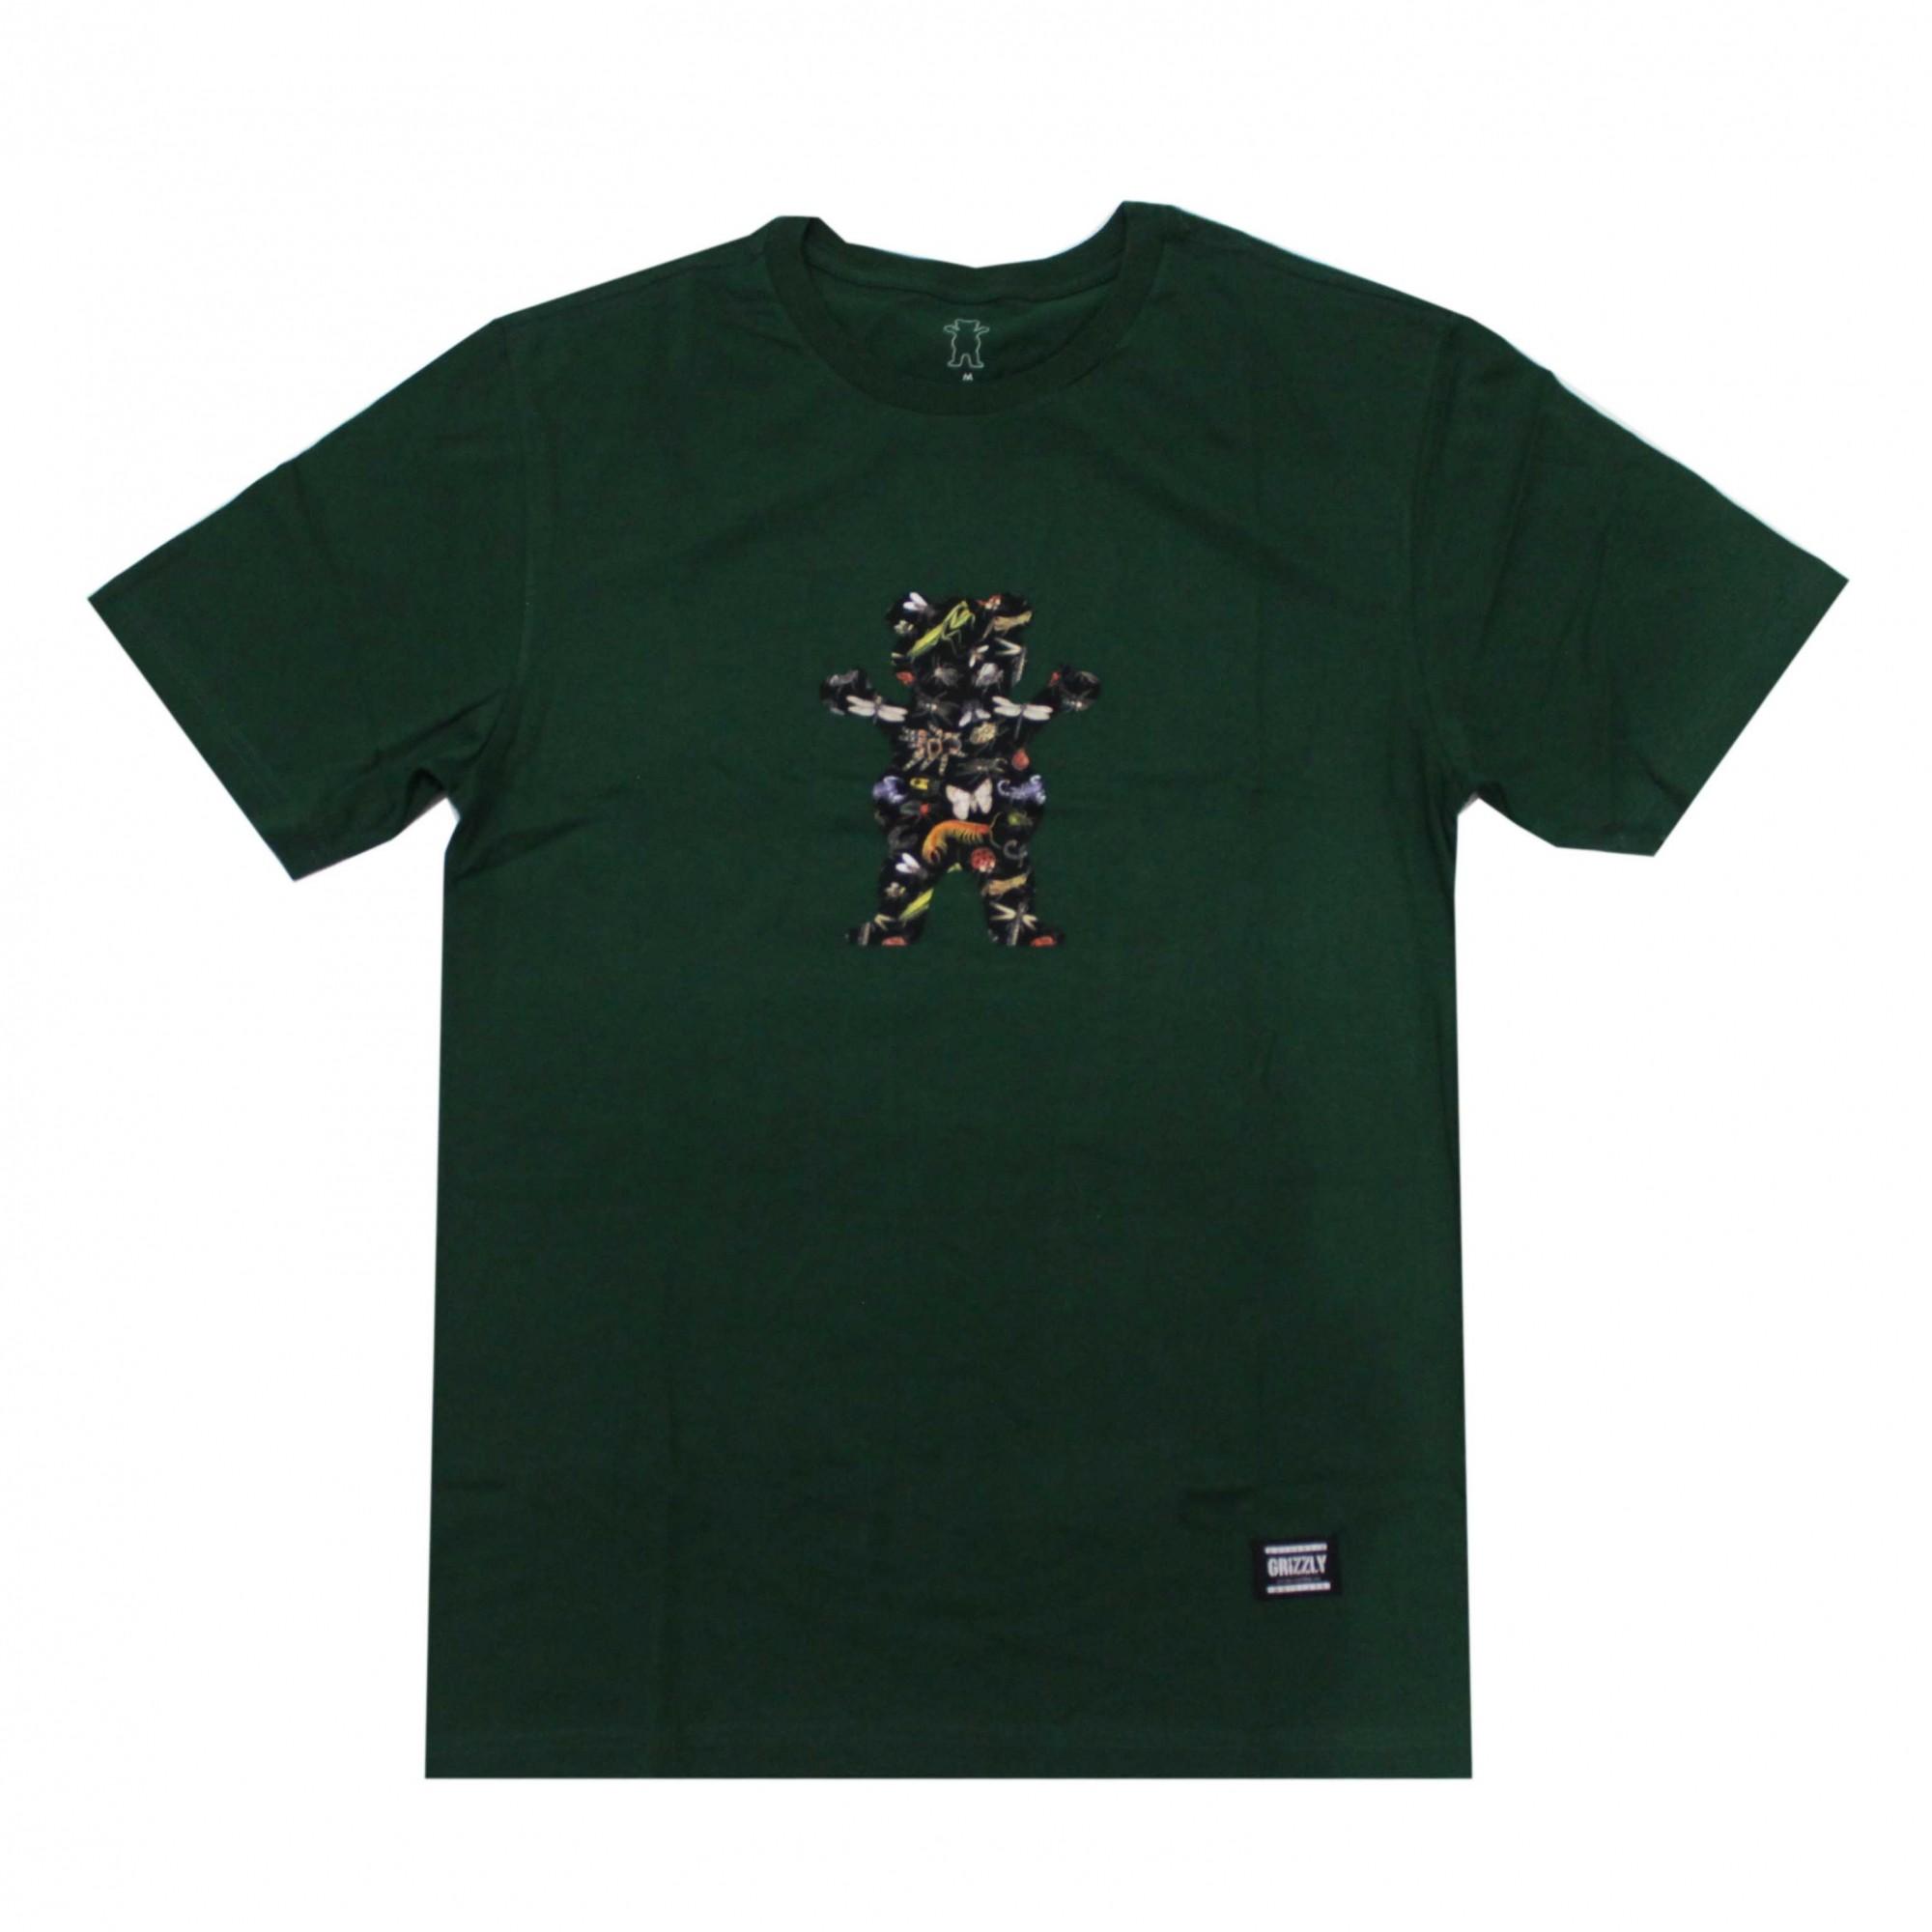 Camiseta Grizzly Boo Bugs Dead - Verde Escuro